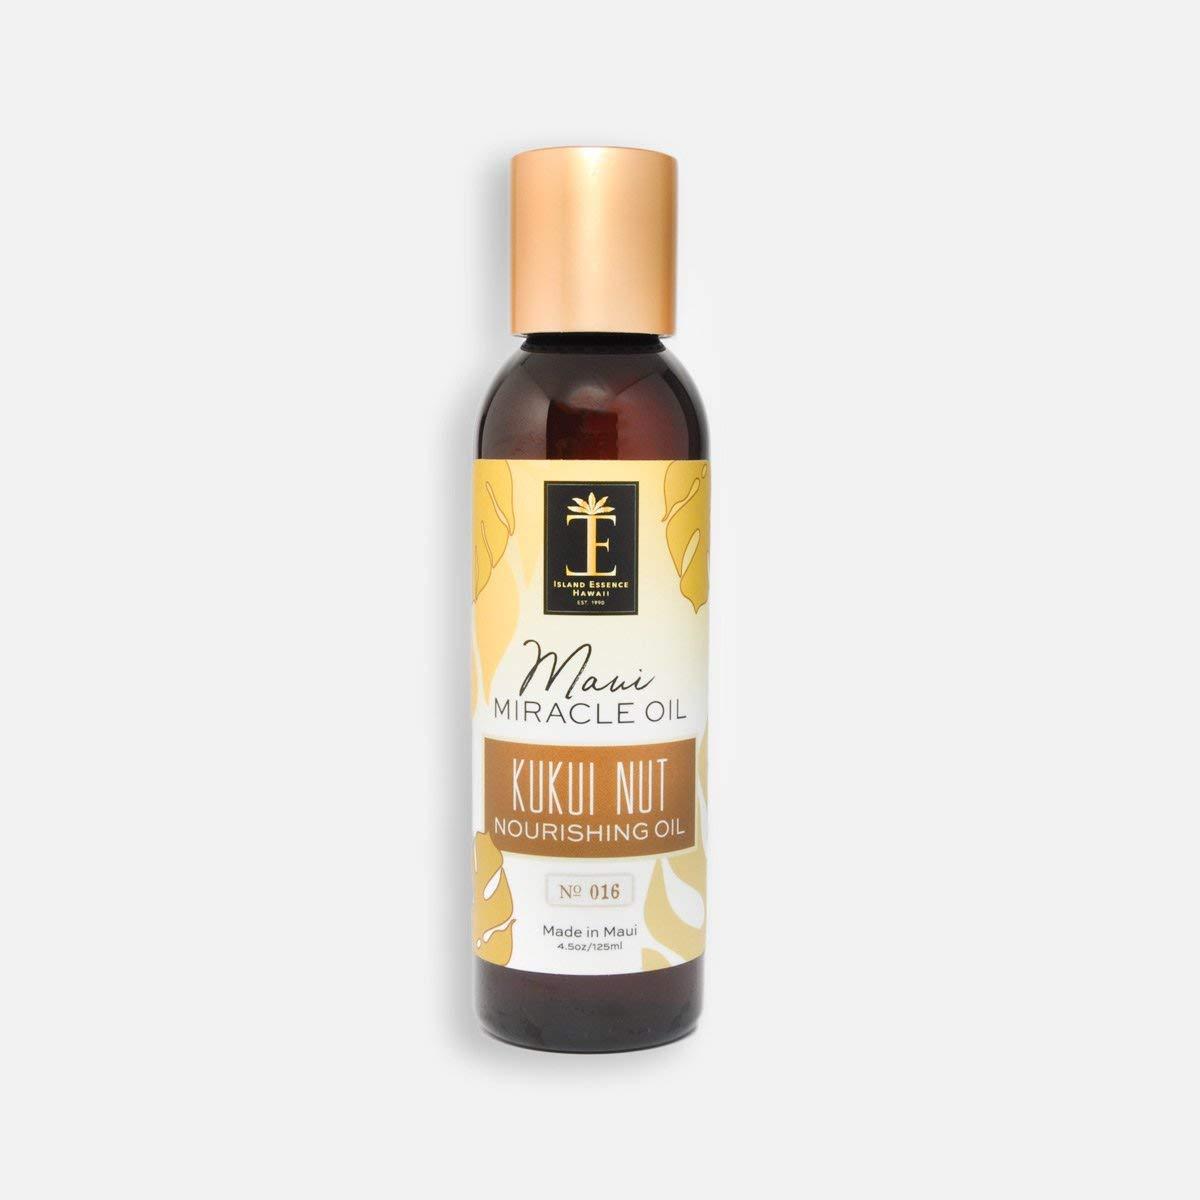 Maui Miracle Oil Hawaii (4.5 Ounce Pump, Kukui Nut Nourishing Oil)